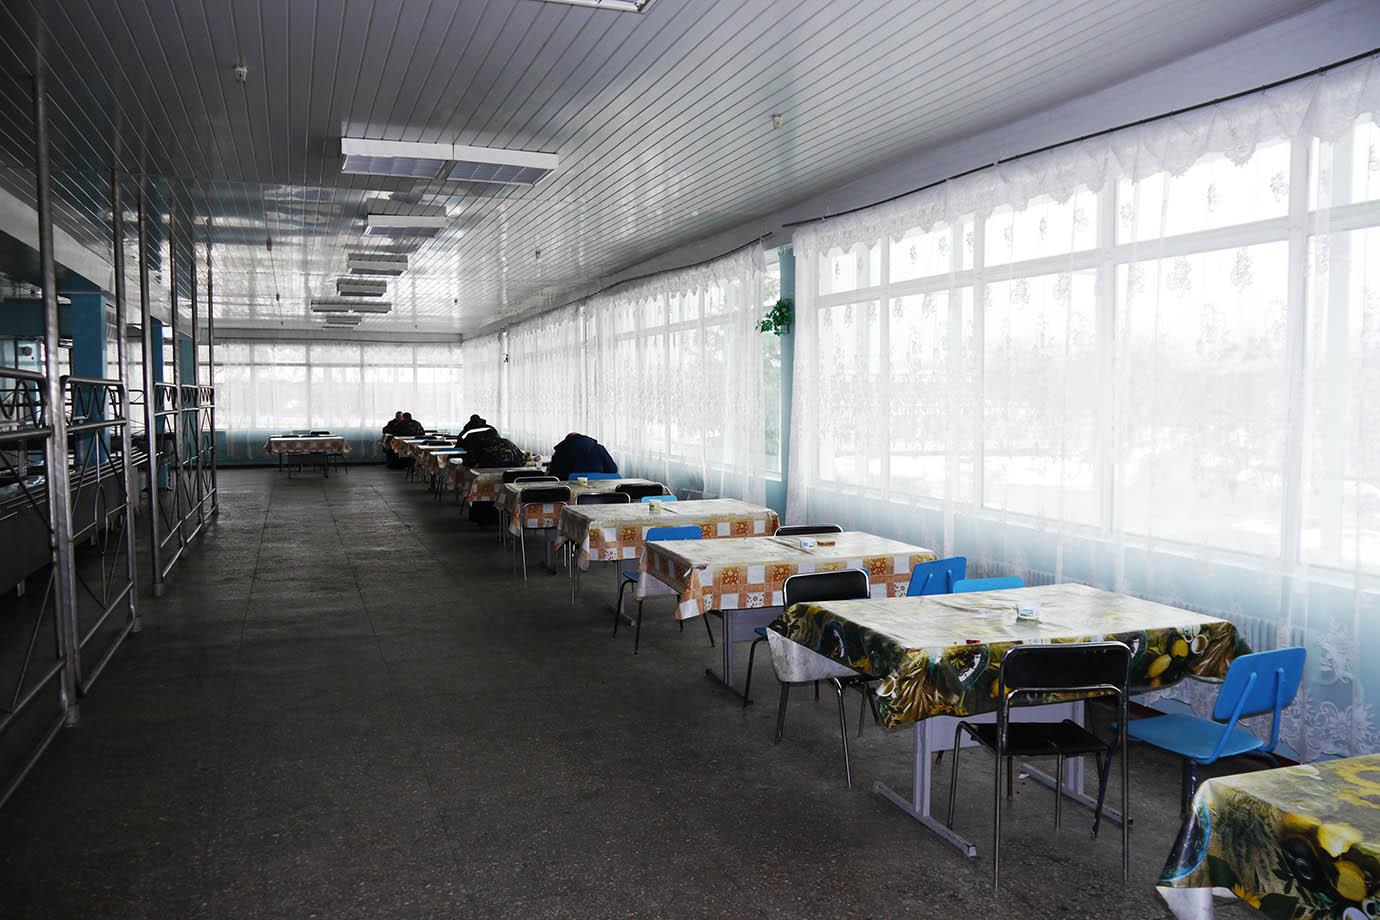 chernobyl-cafeteria13